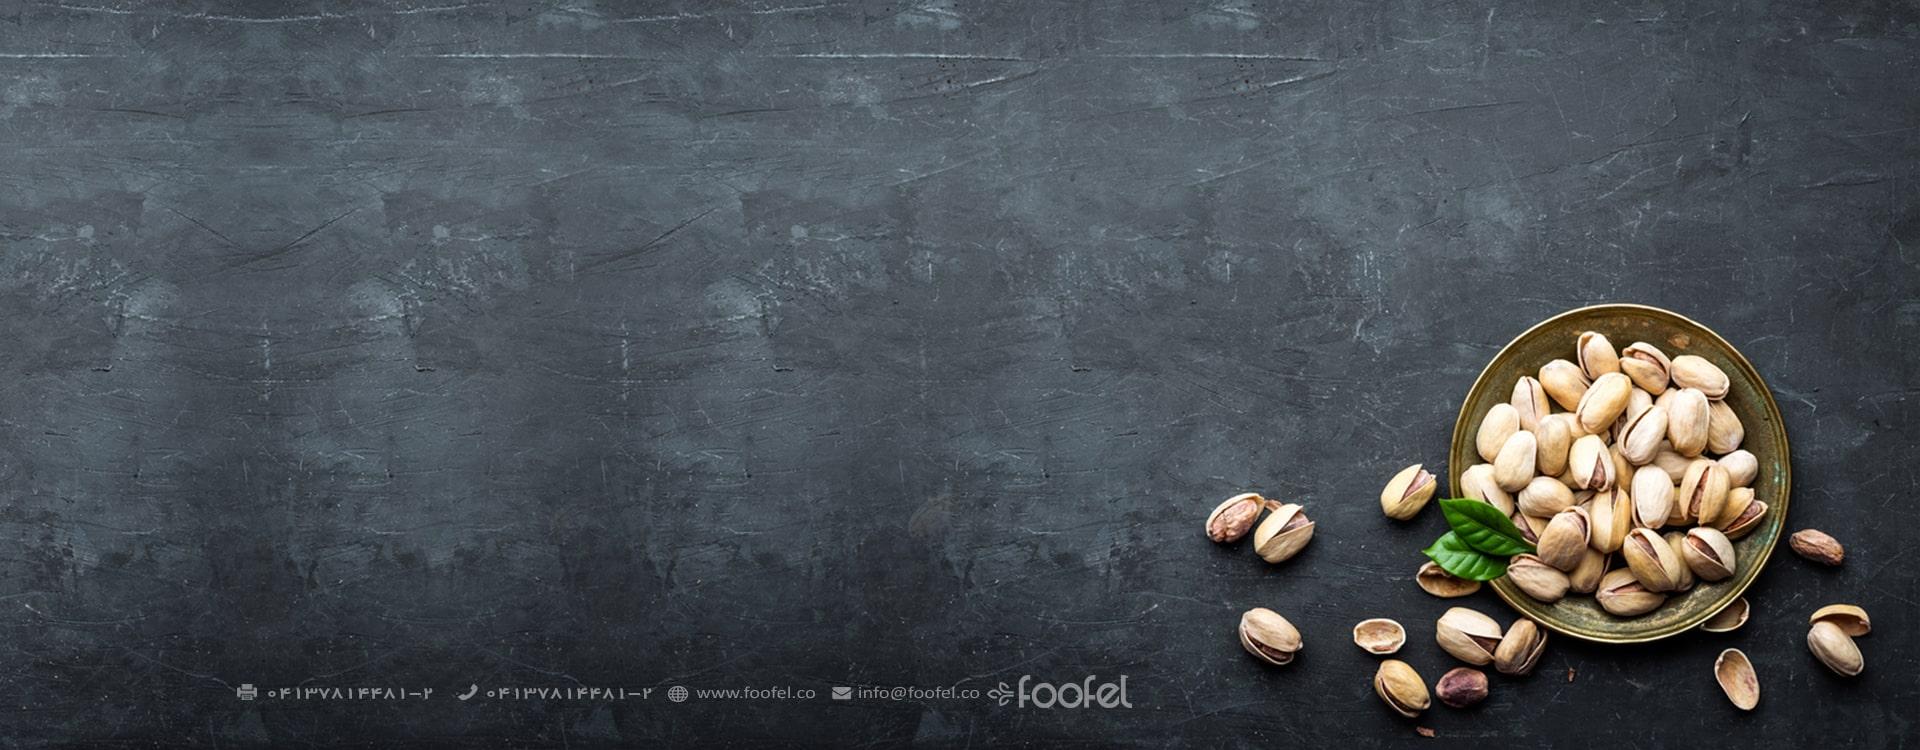 iranian pistachios،foofel